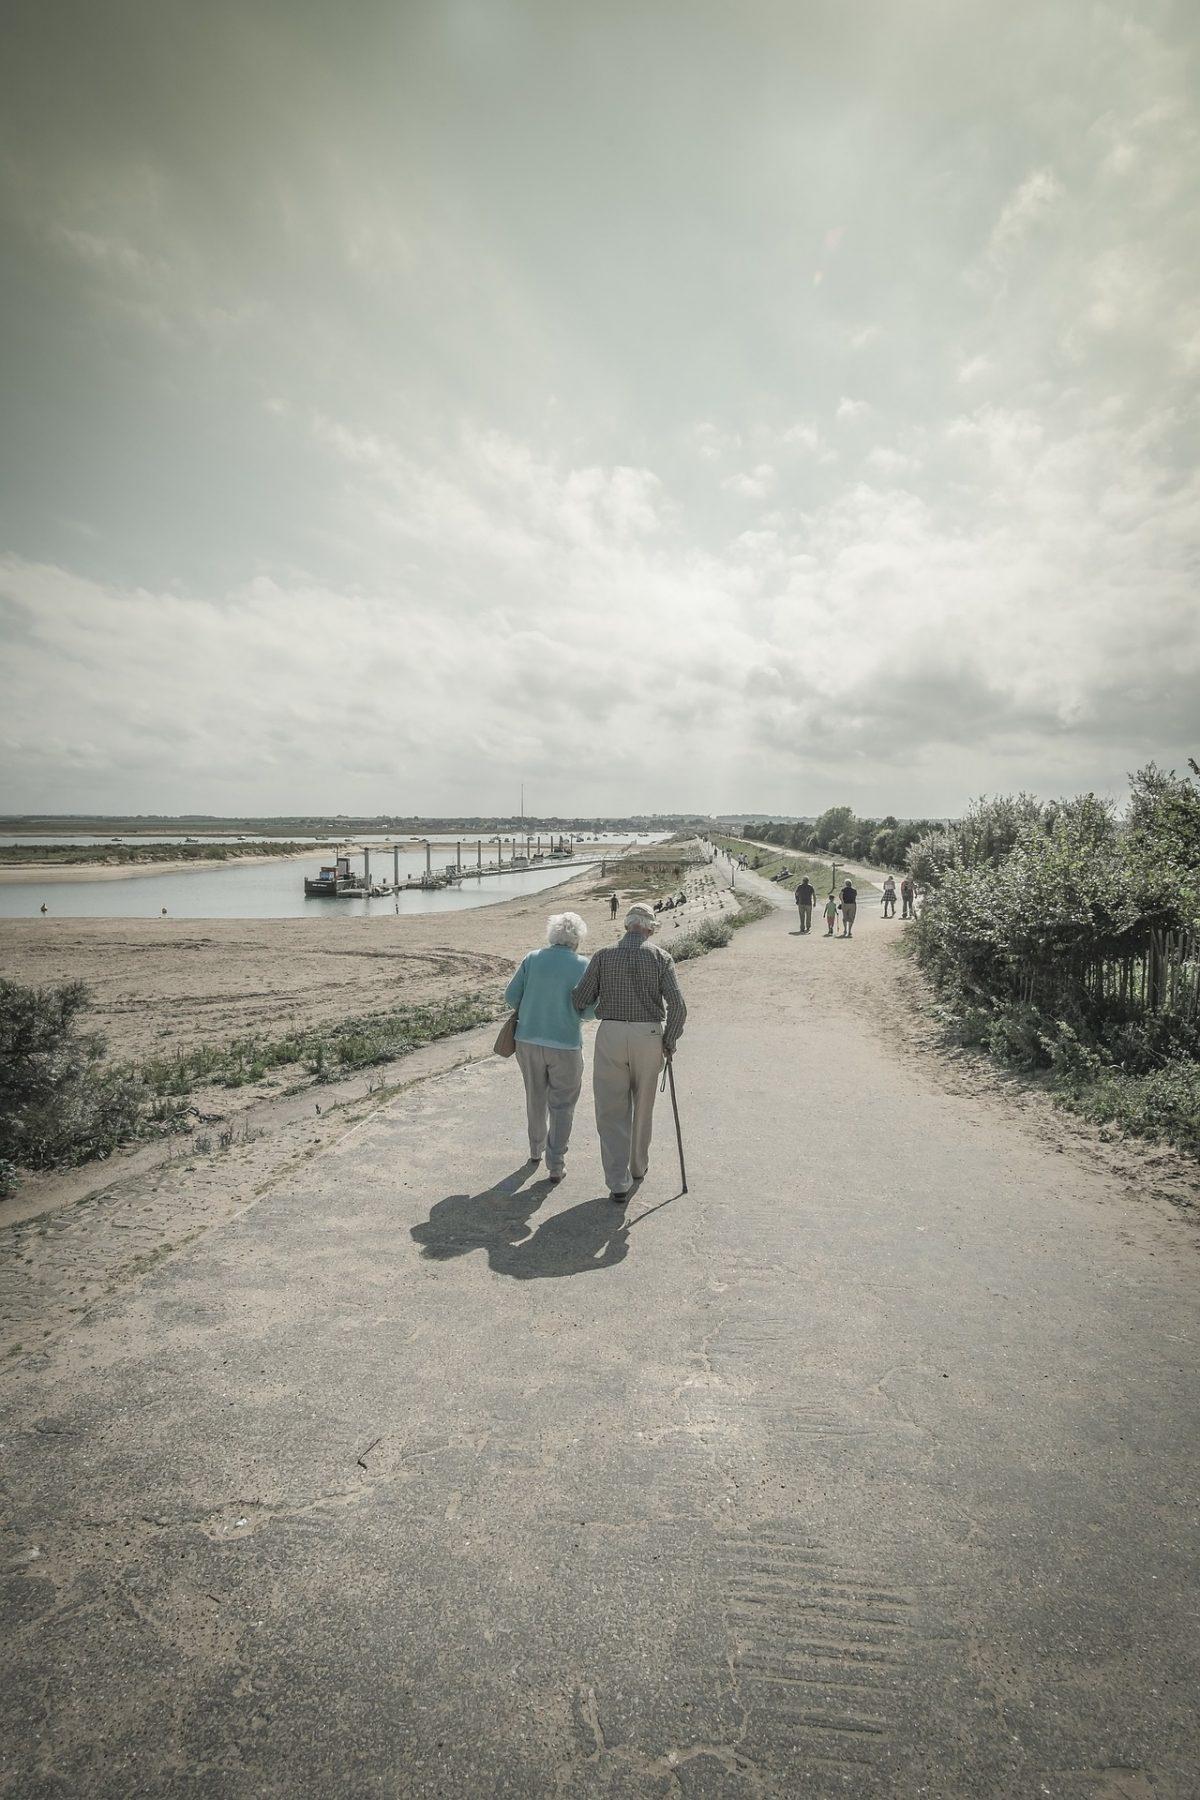 Benefits of walking for elderly